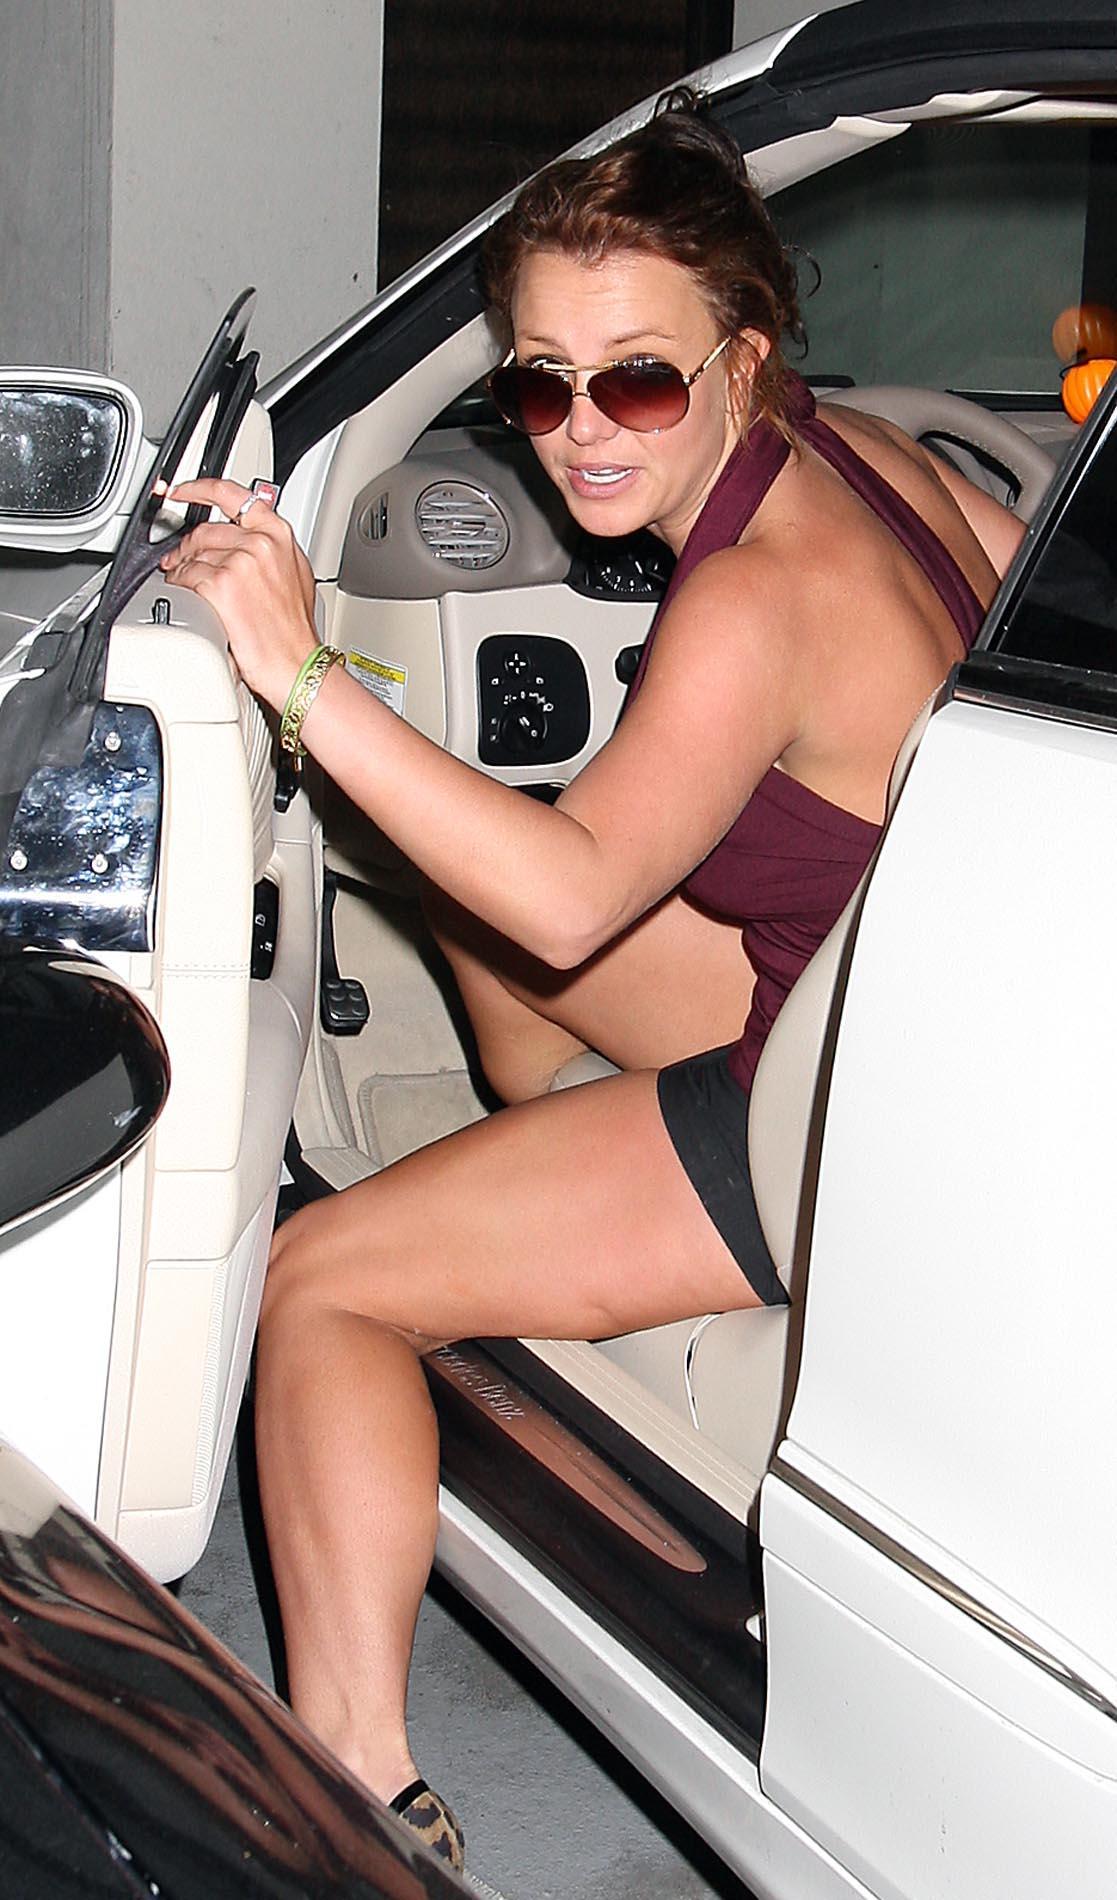 Britney Spears Calls Her Conservatorship 'F***ing Cruelty'